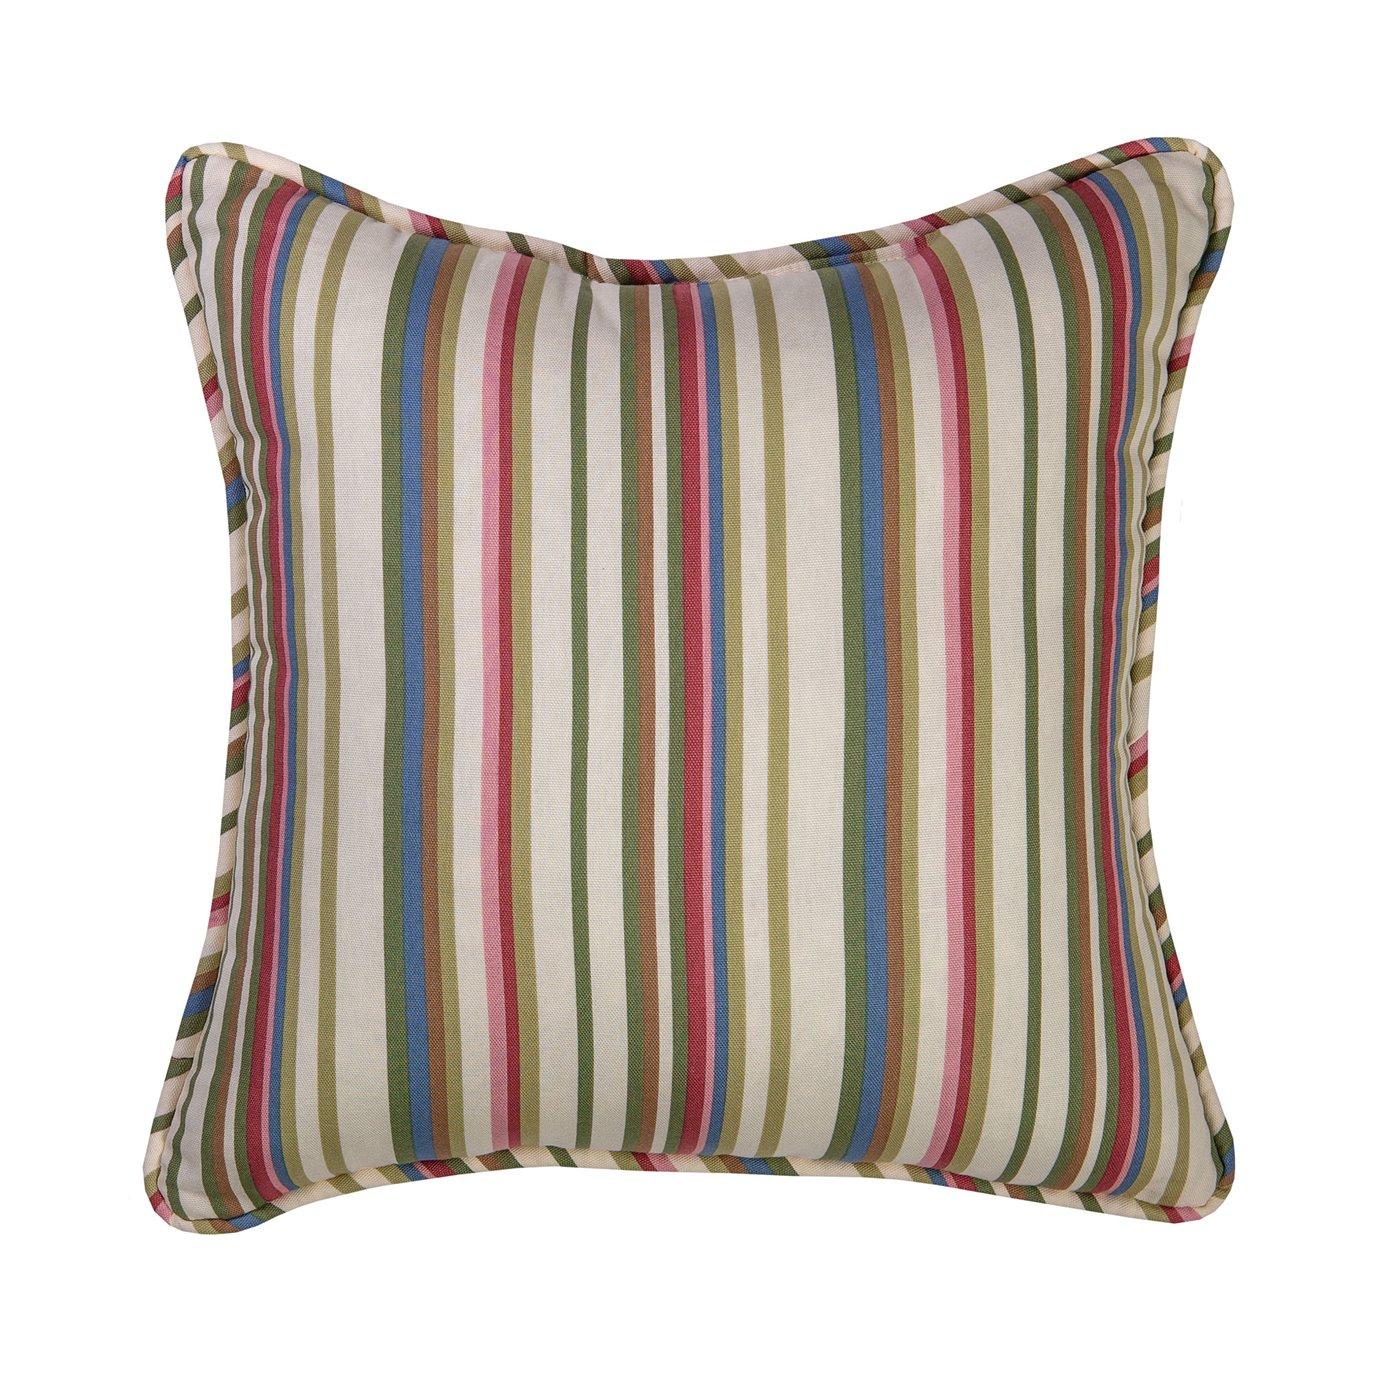 Hillhouse Square Pillow - Stripe